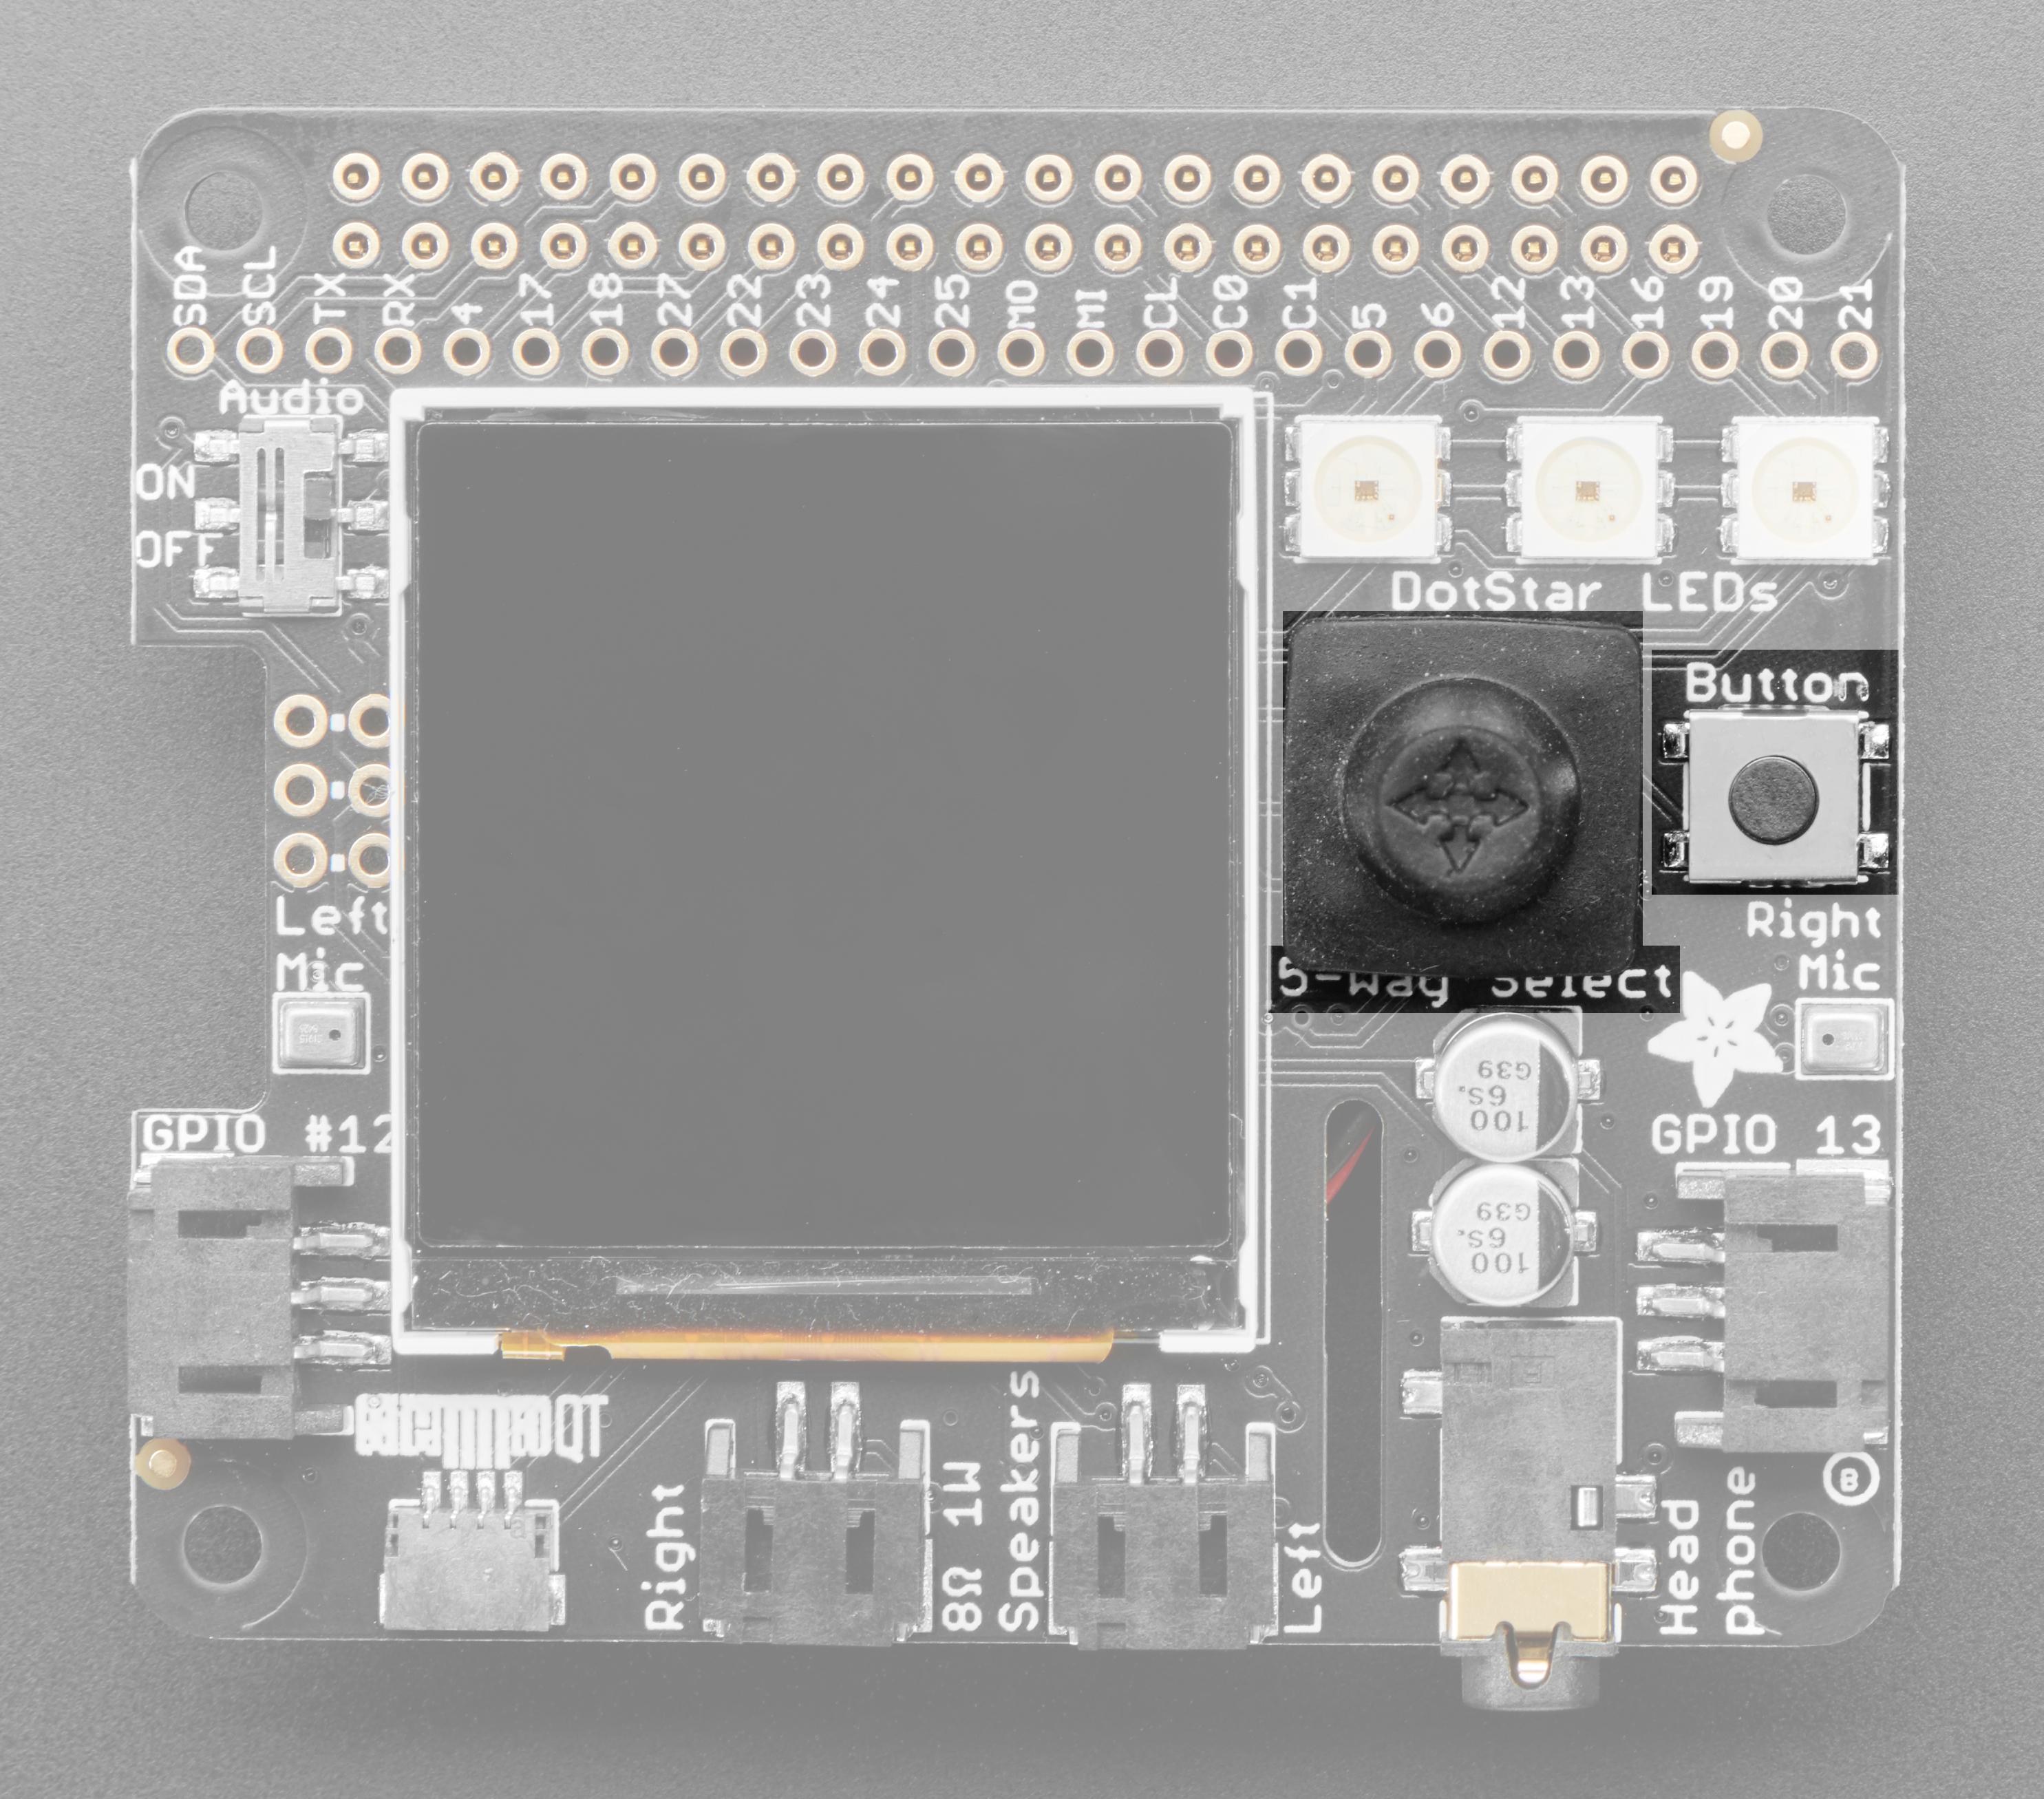 adafruit_products_Braincraft_HAT_pinouts_button_joystick.jpg